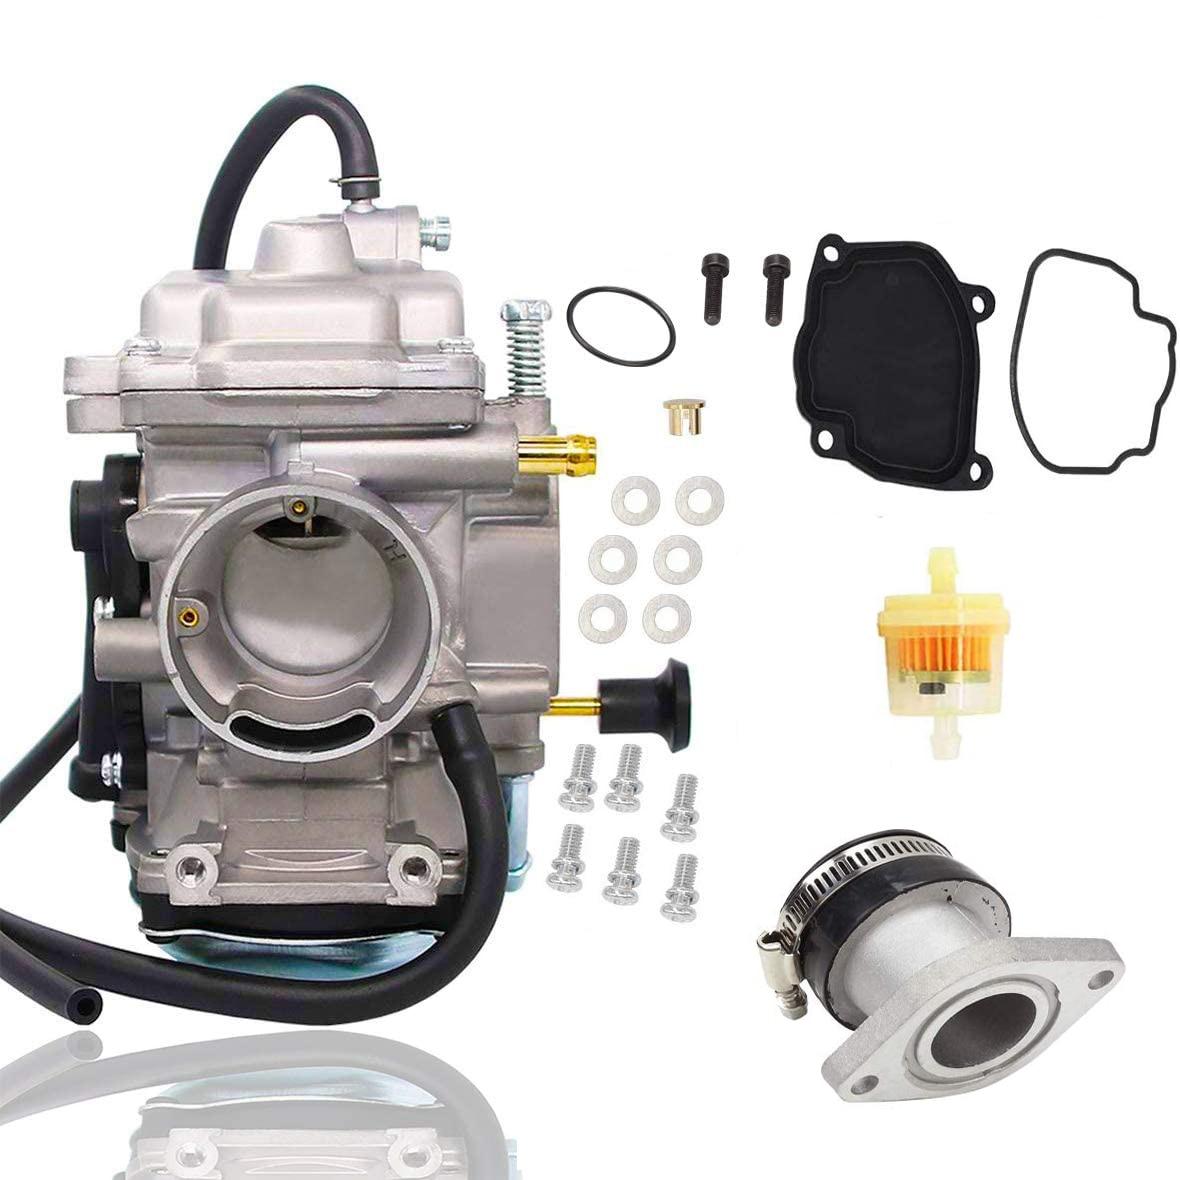 Carb Intake Manifold Fuel Filter For Yamaha Bear Tracker YFM 250 1999-2004 ATV